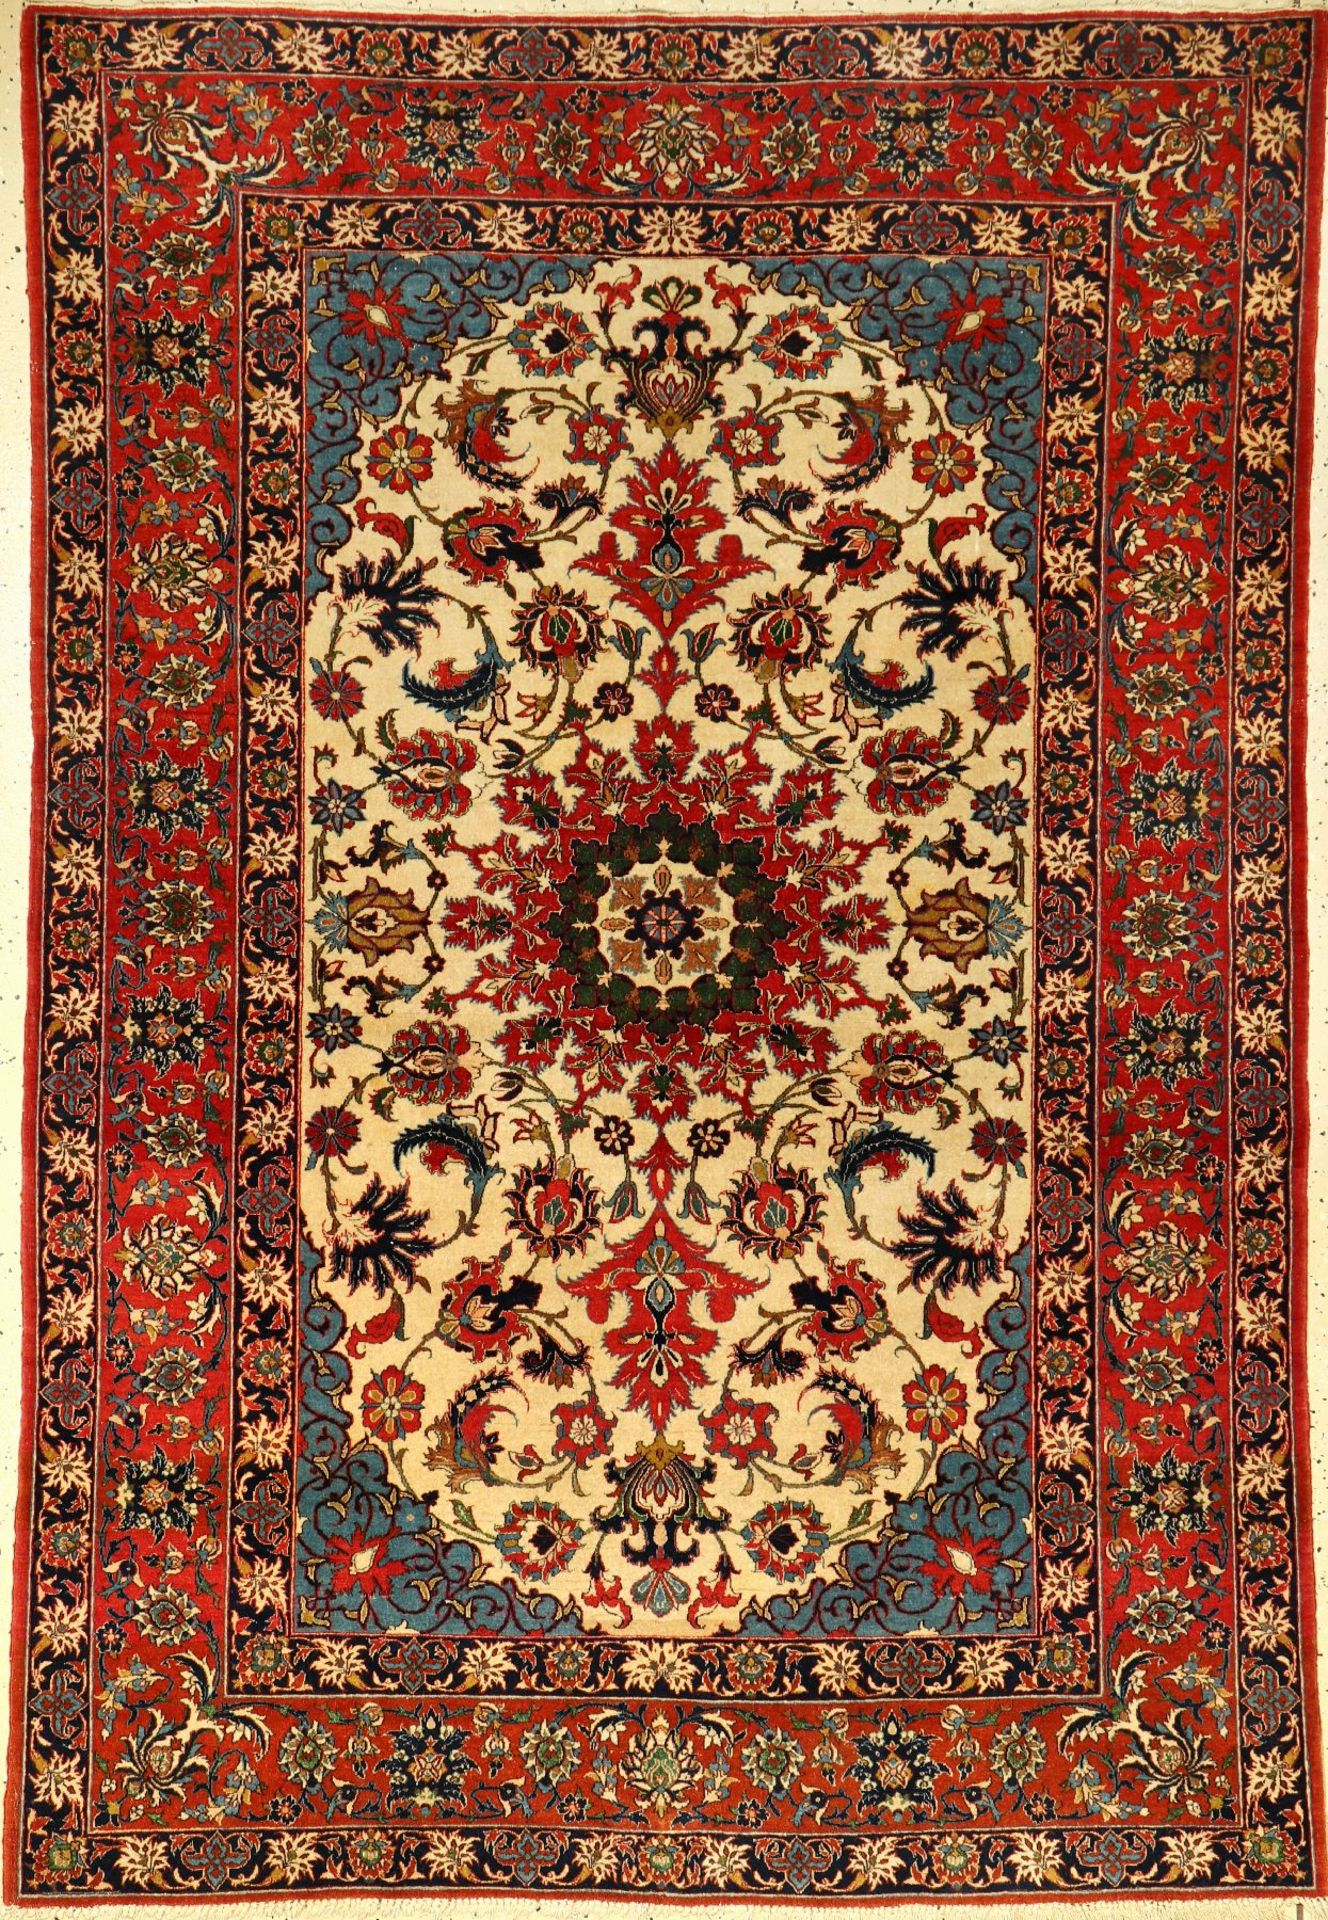 Feiner Esfahan alt, Persien, um 1930, Korkwolle, ca. 214 x 148 cm, feiner Qualität, Dekorativ,